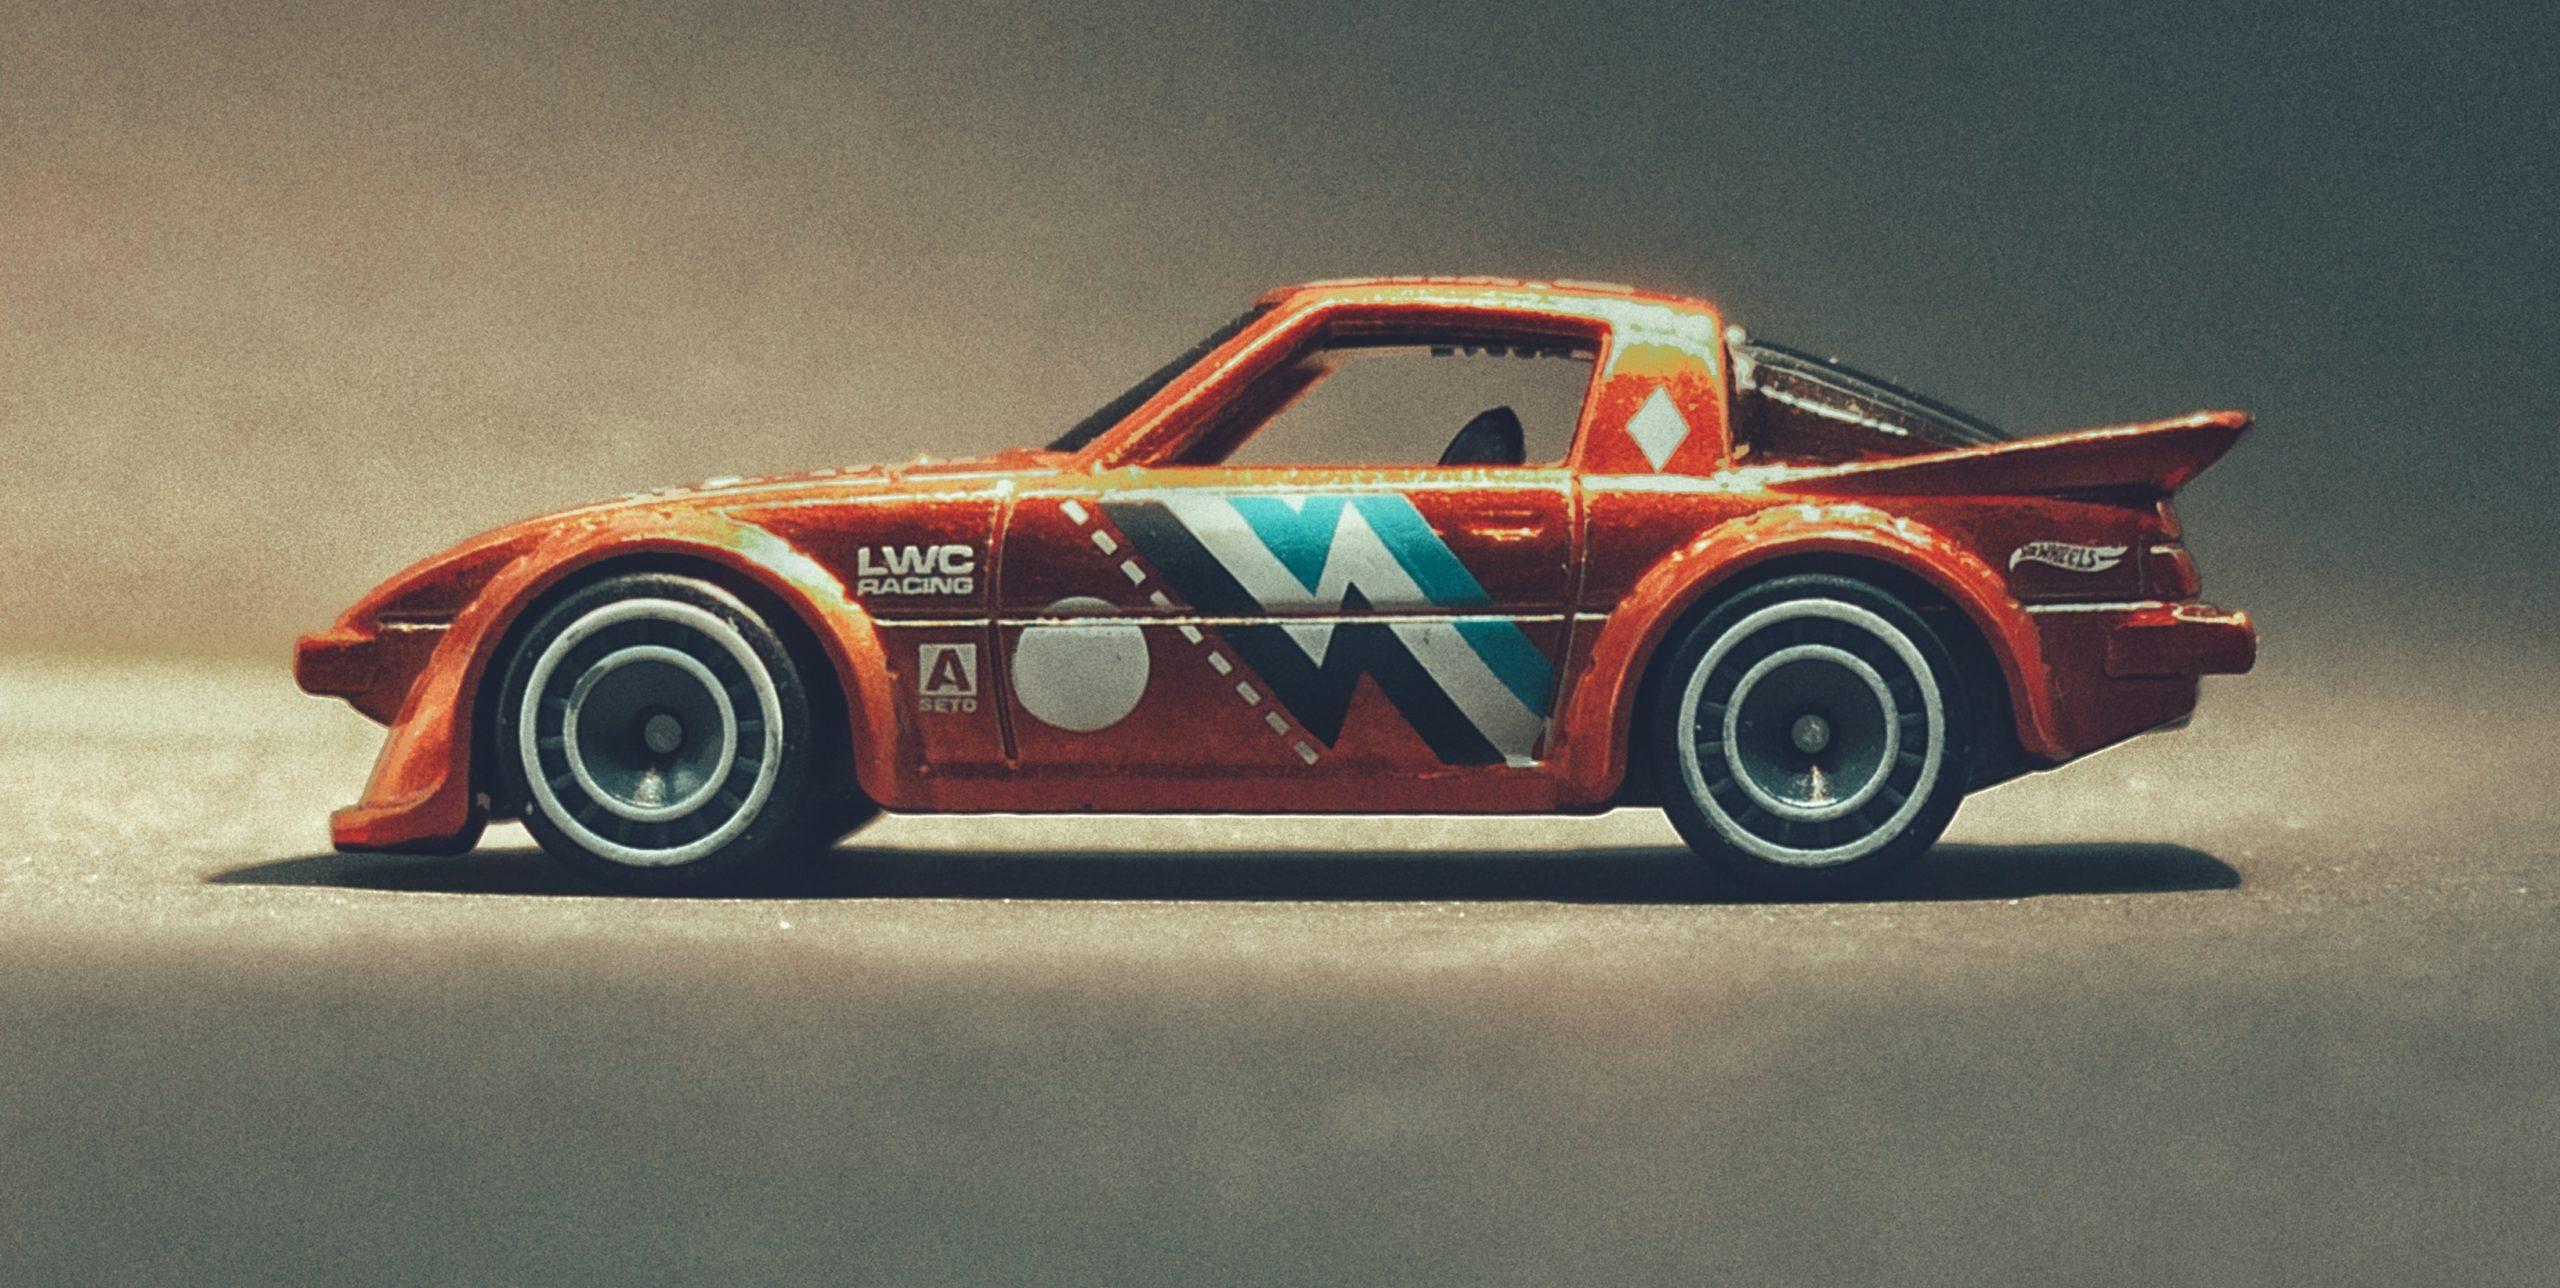 Hot Wheels Mazda RX-7 (GHG28) 2020 (130/250) Speed Blur (5/5) spectraflame orange Super Treasure Hunt (STH) side